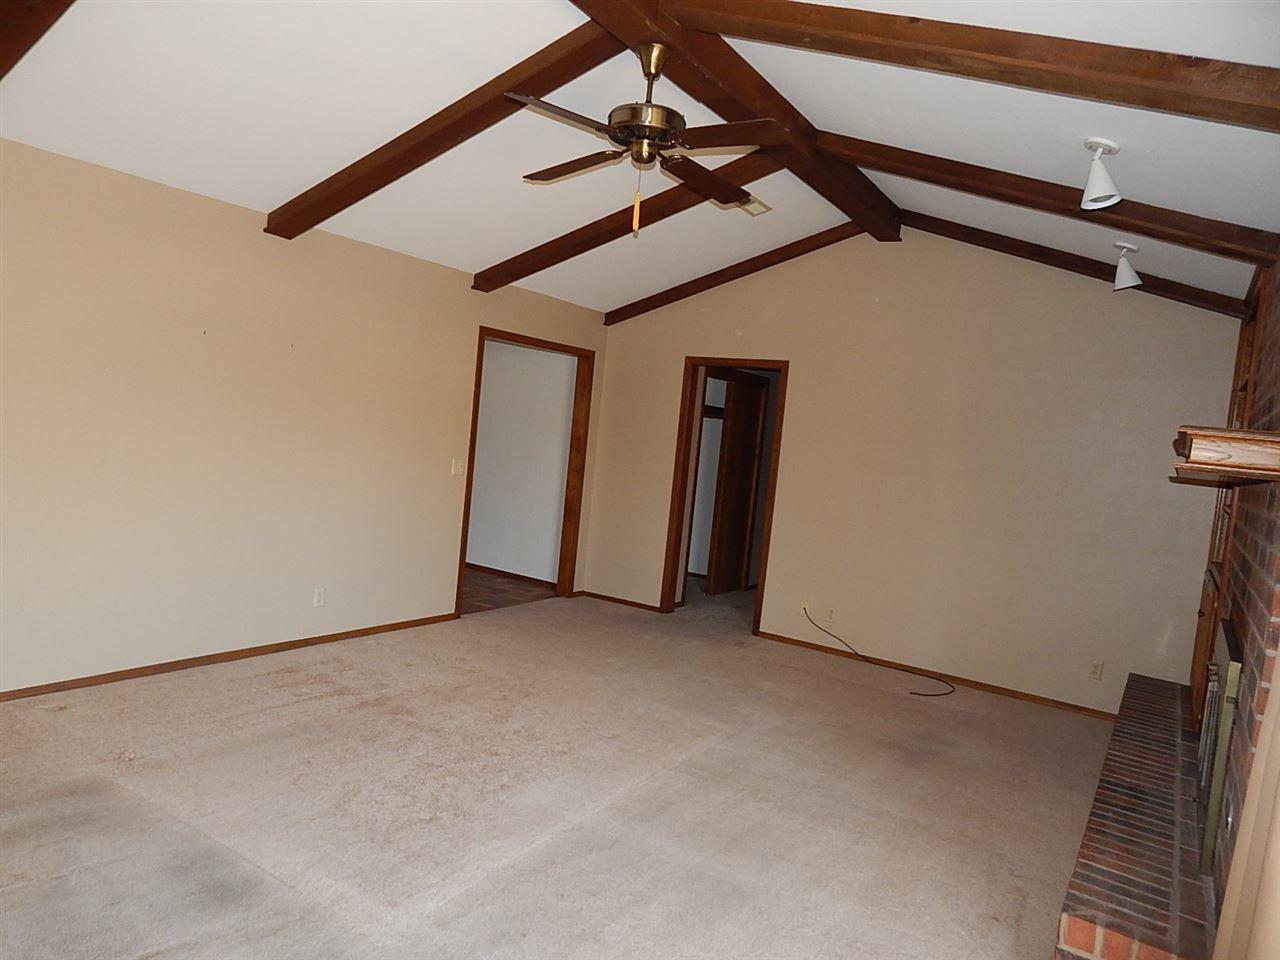 Sold Cross Sale W/ MLS | 2312 Calvert Ponca City, OK 74601 3